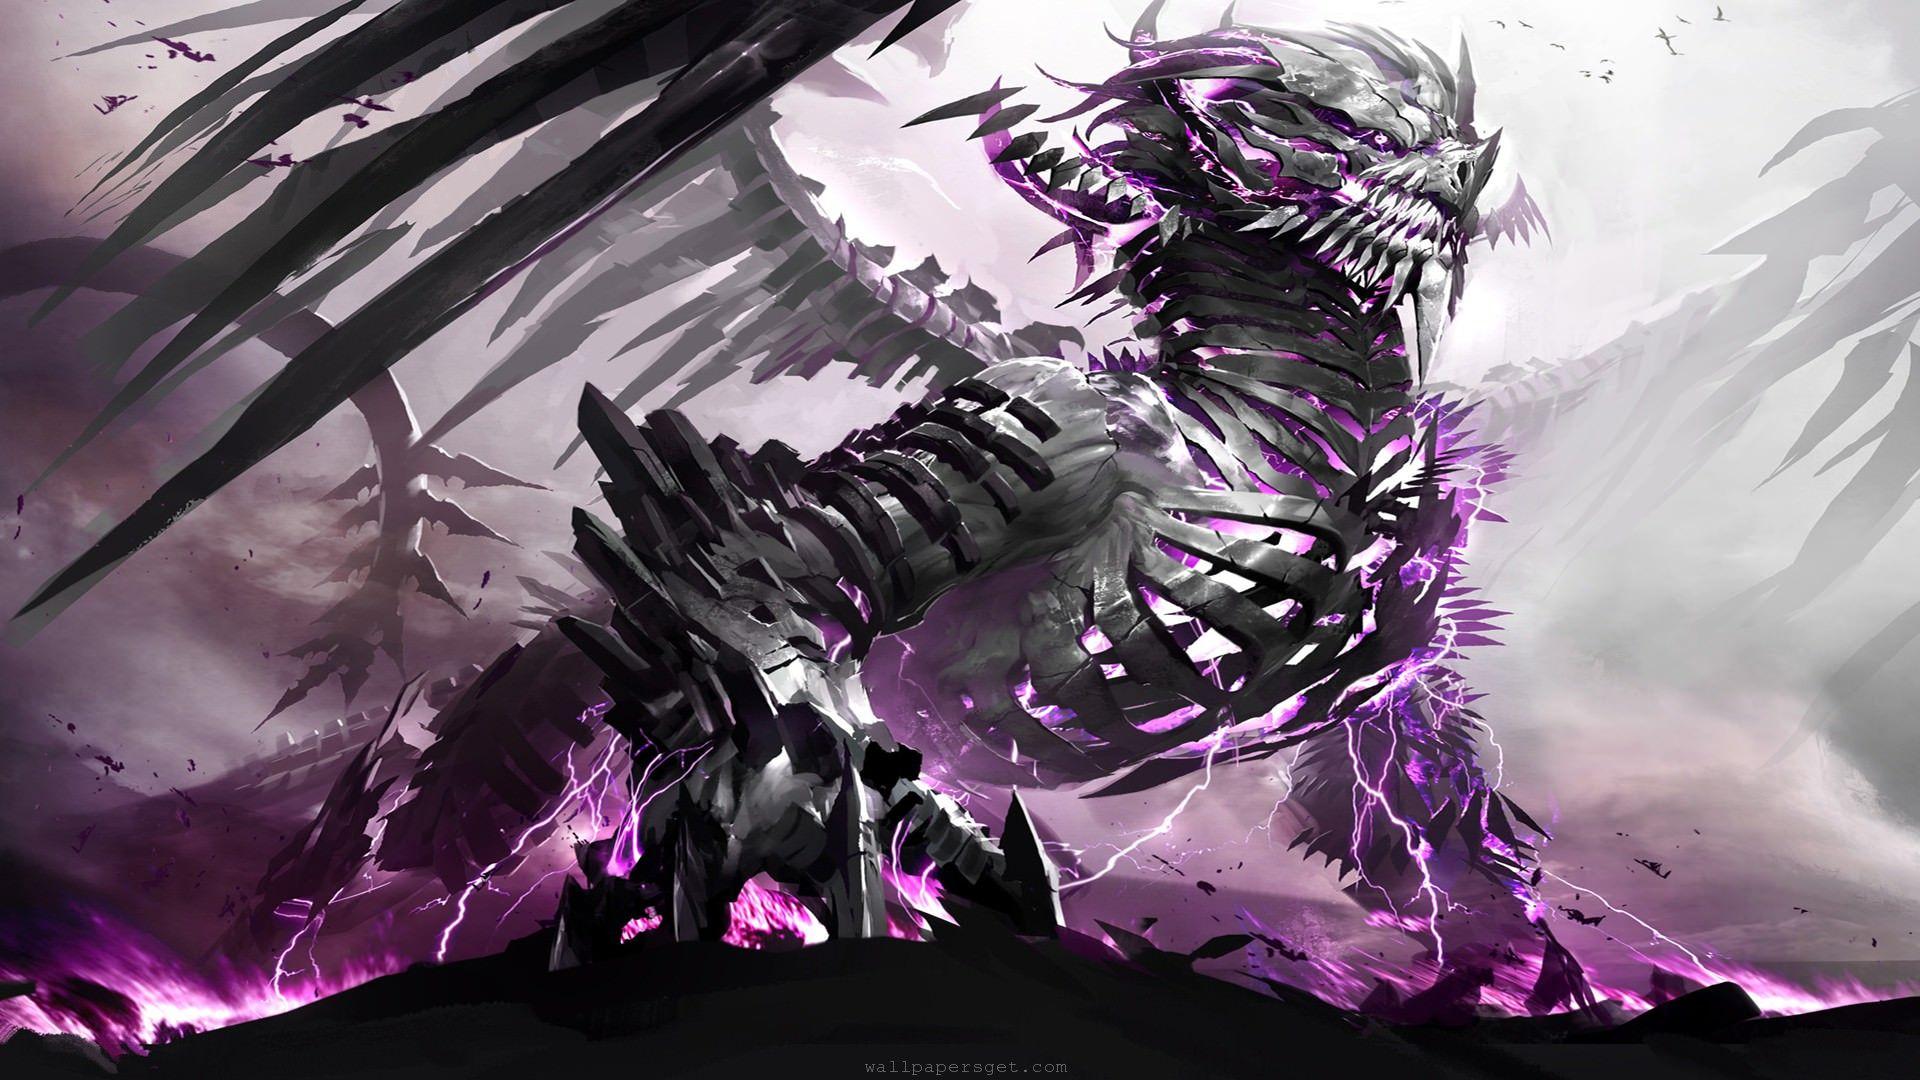 Purple Dragon HD Desktop Wallpaper 19201080